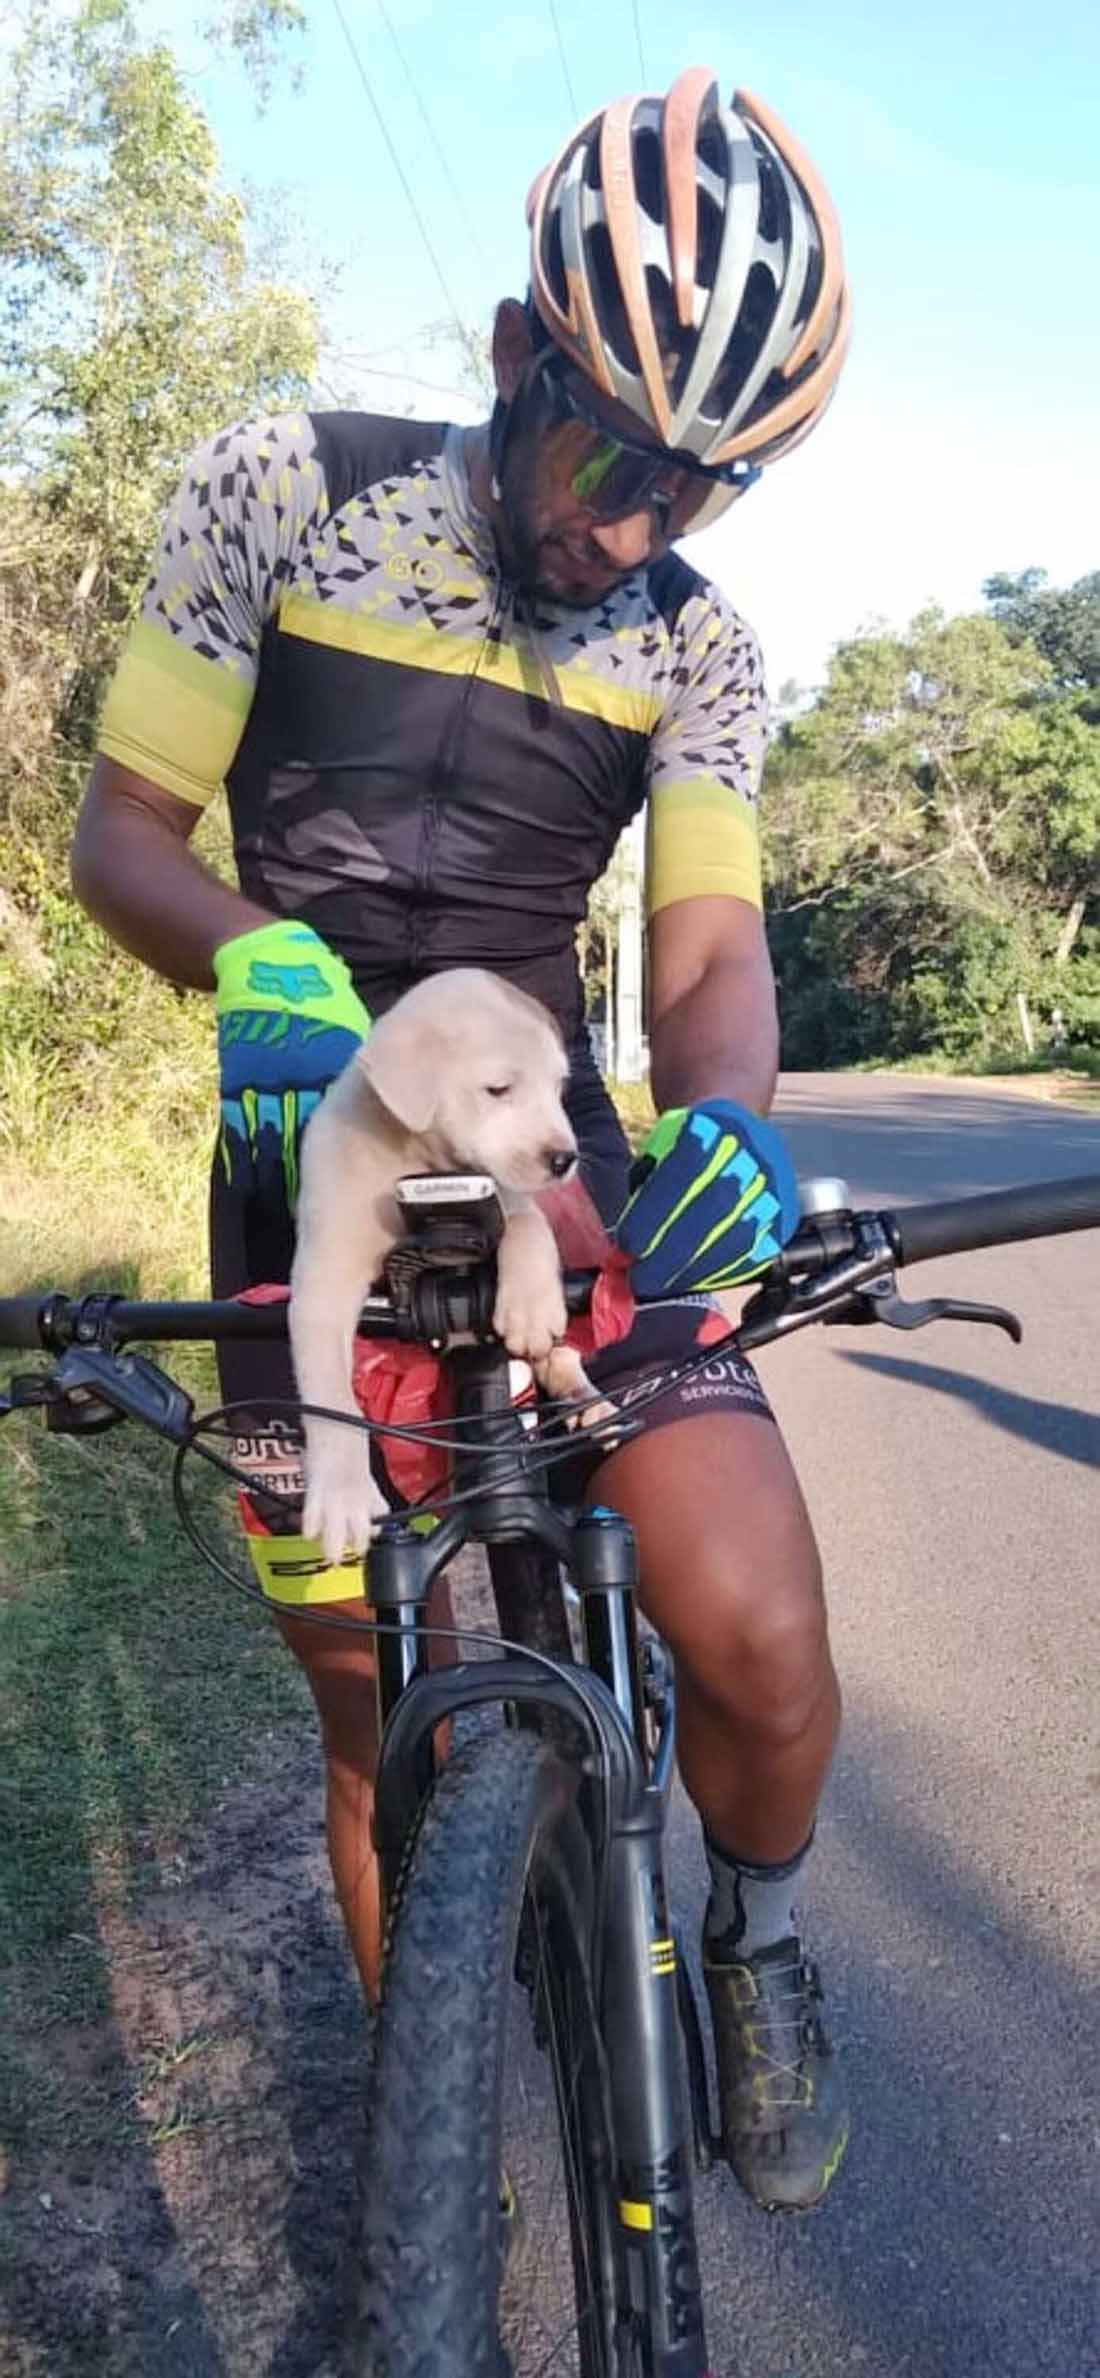 Ciclista ve a un cachorro en la carretera